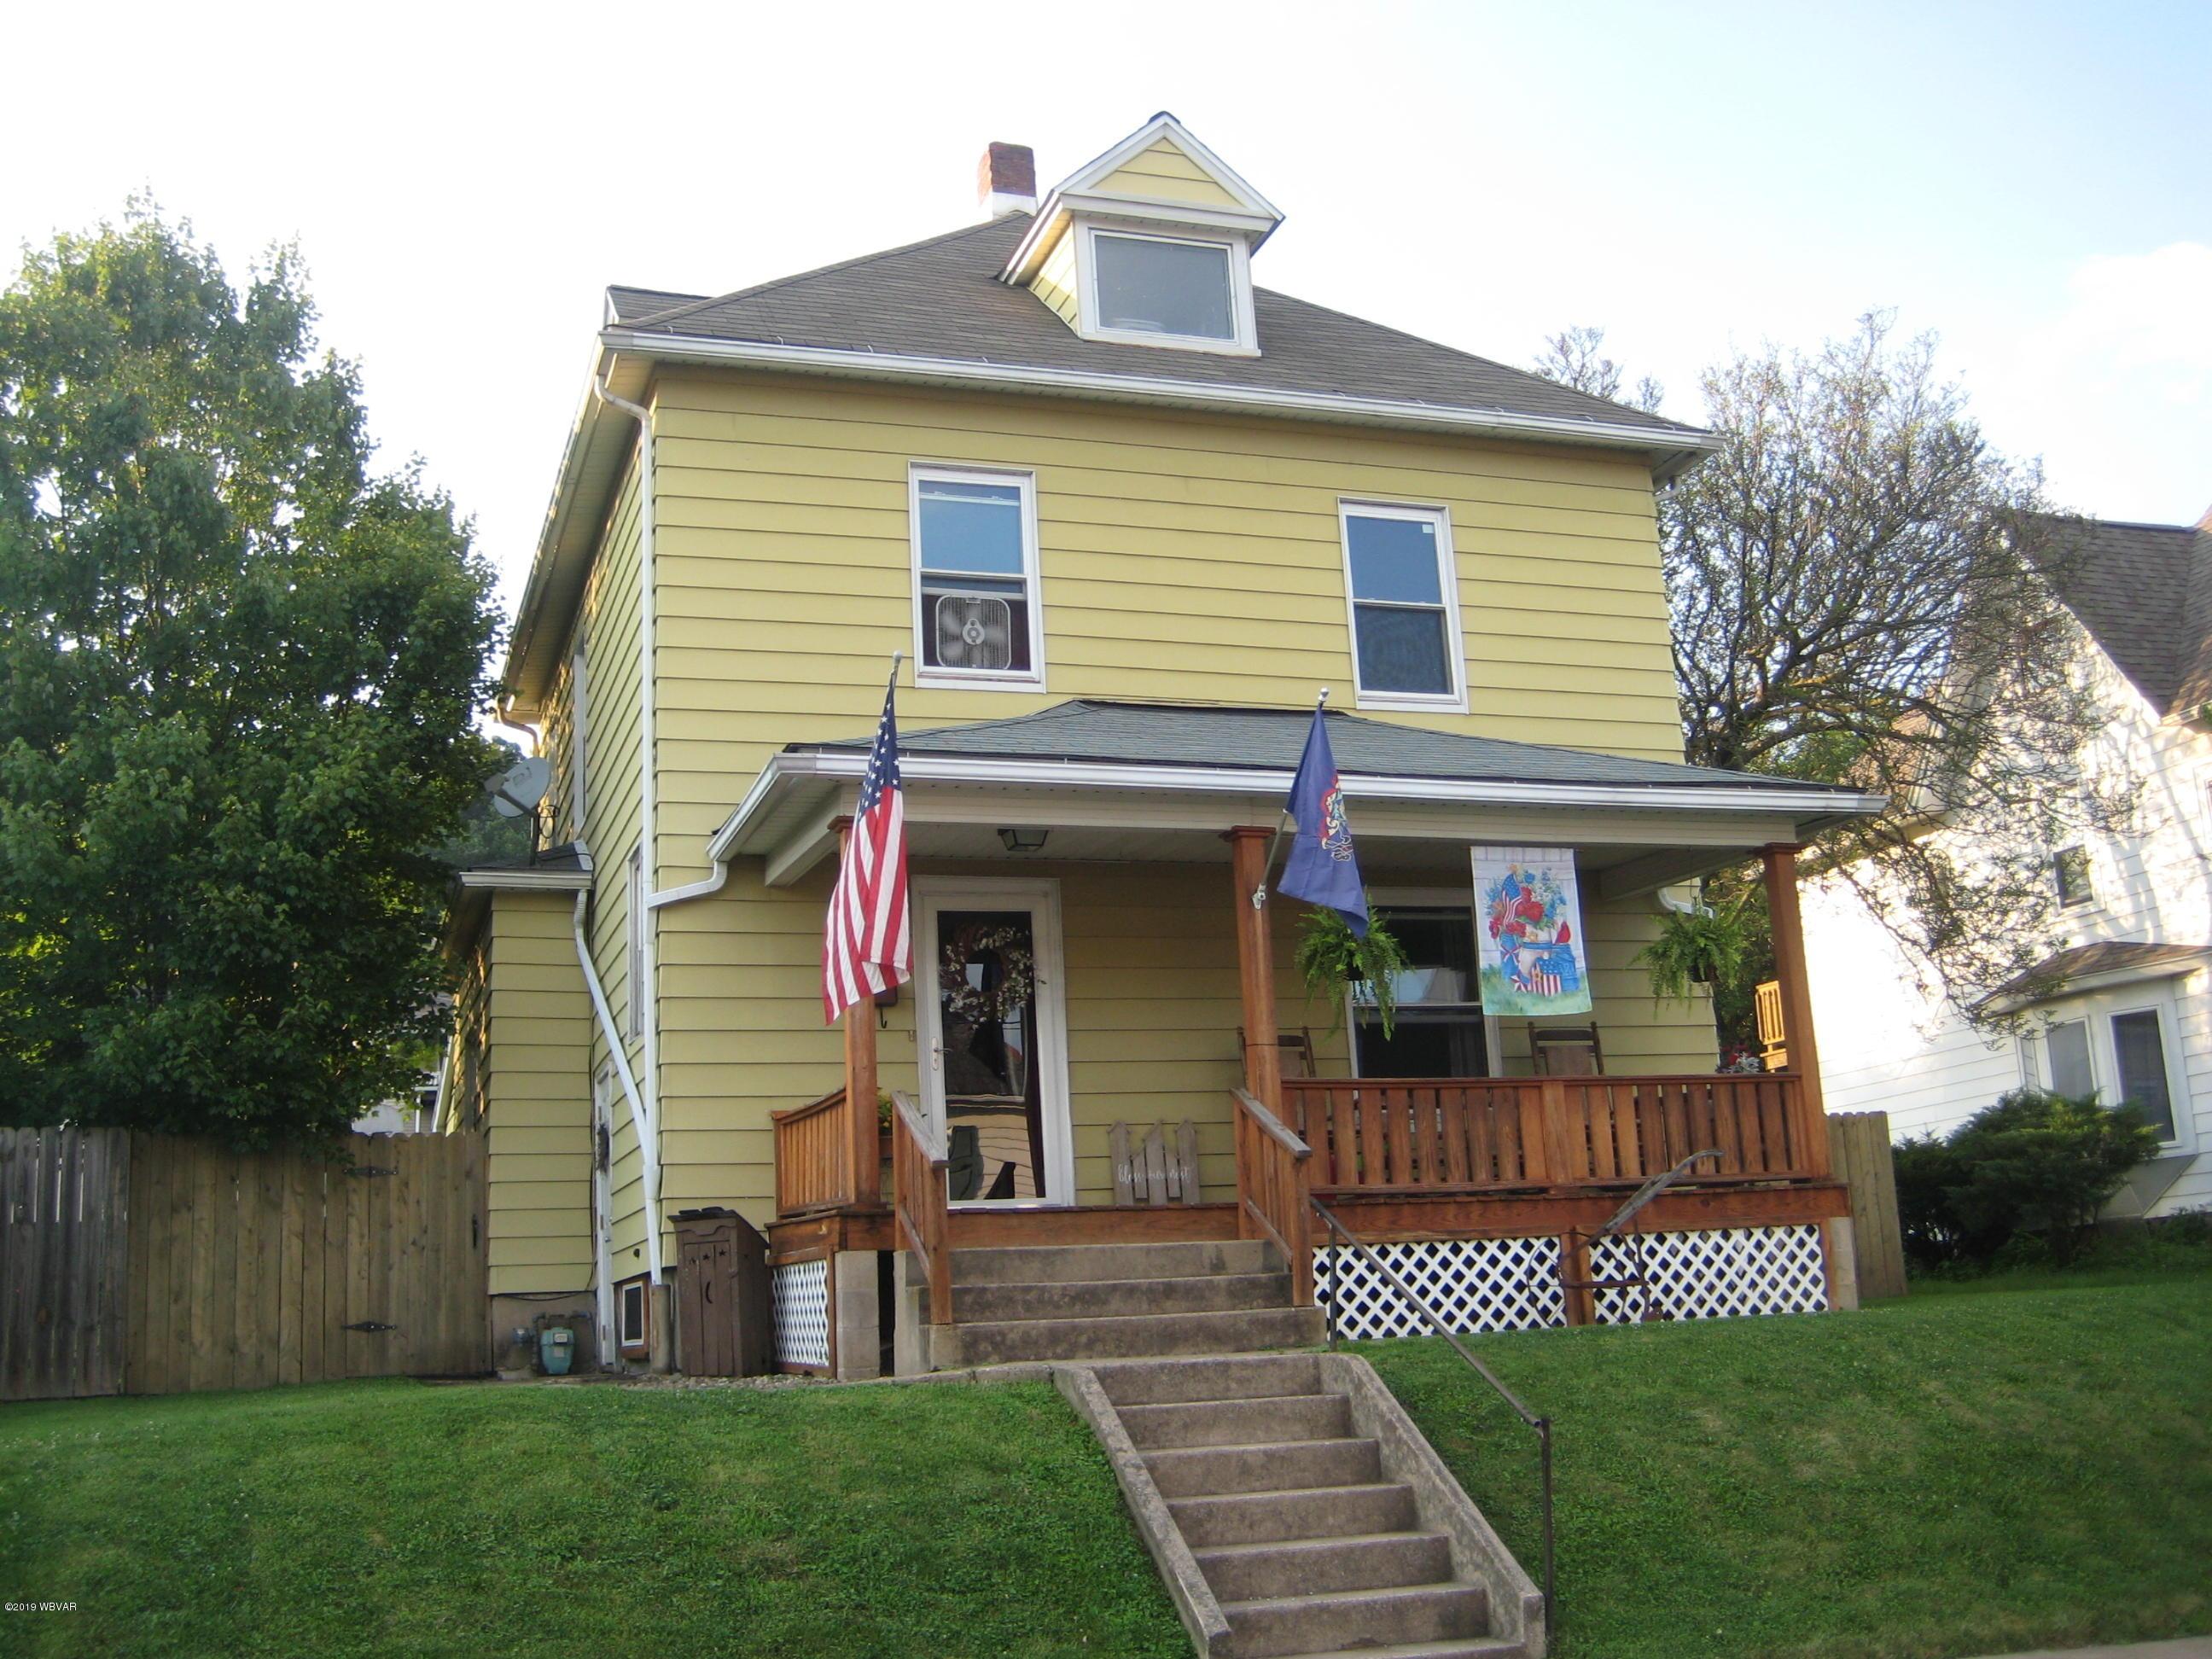 2336 NEWBERRY STREET,Williamsport,PA 17701,3 Bedrooms Bedrooms,1 BathroomBathrooms,Residential,NEWBERRY,WB-87954